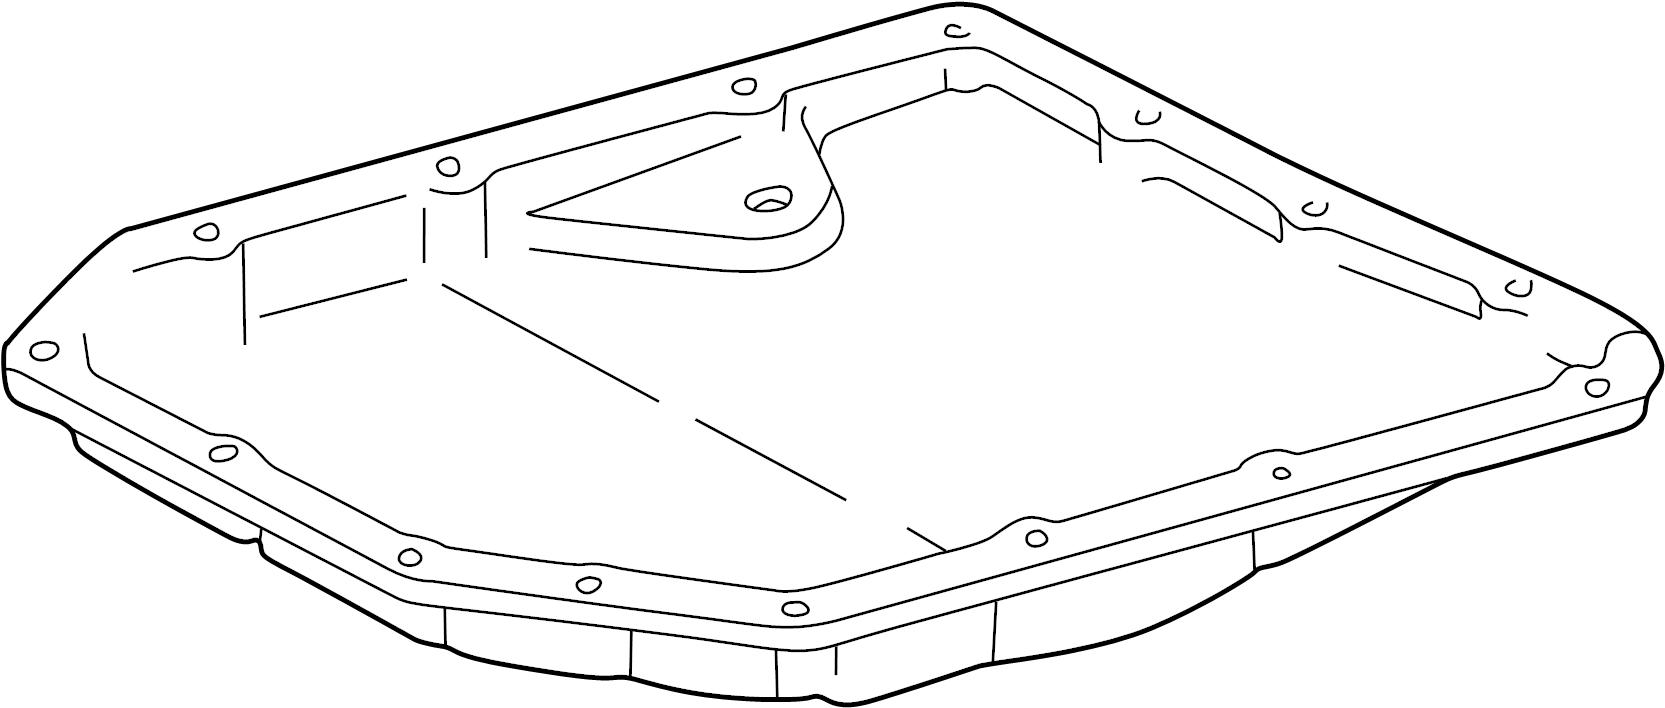 toyota a140e transmission diagrams